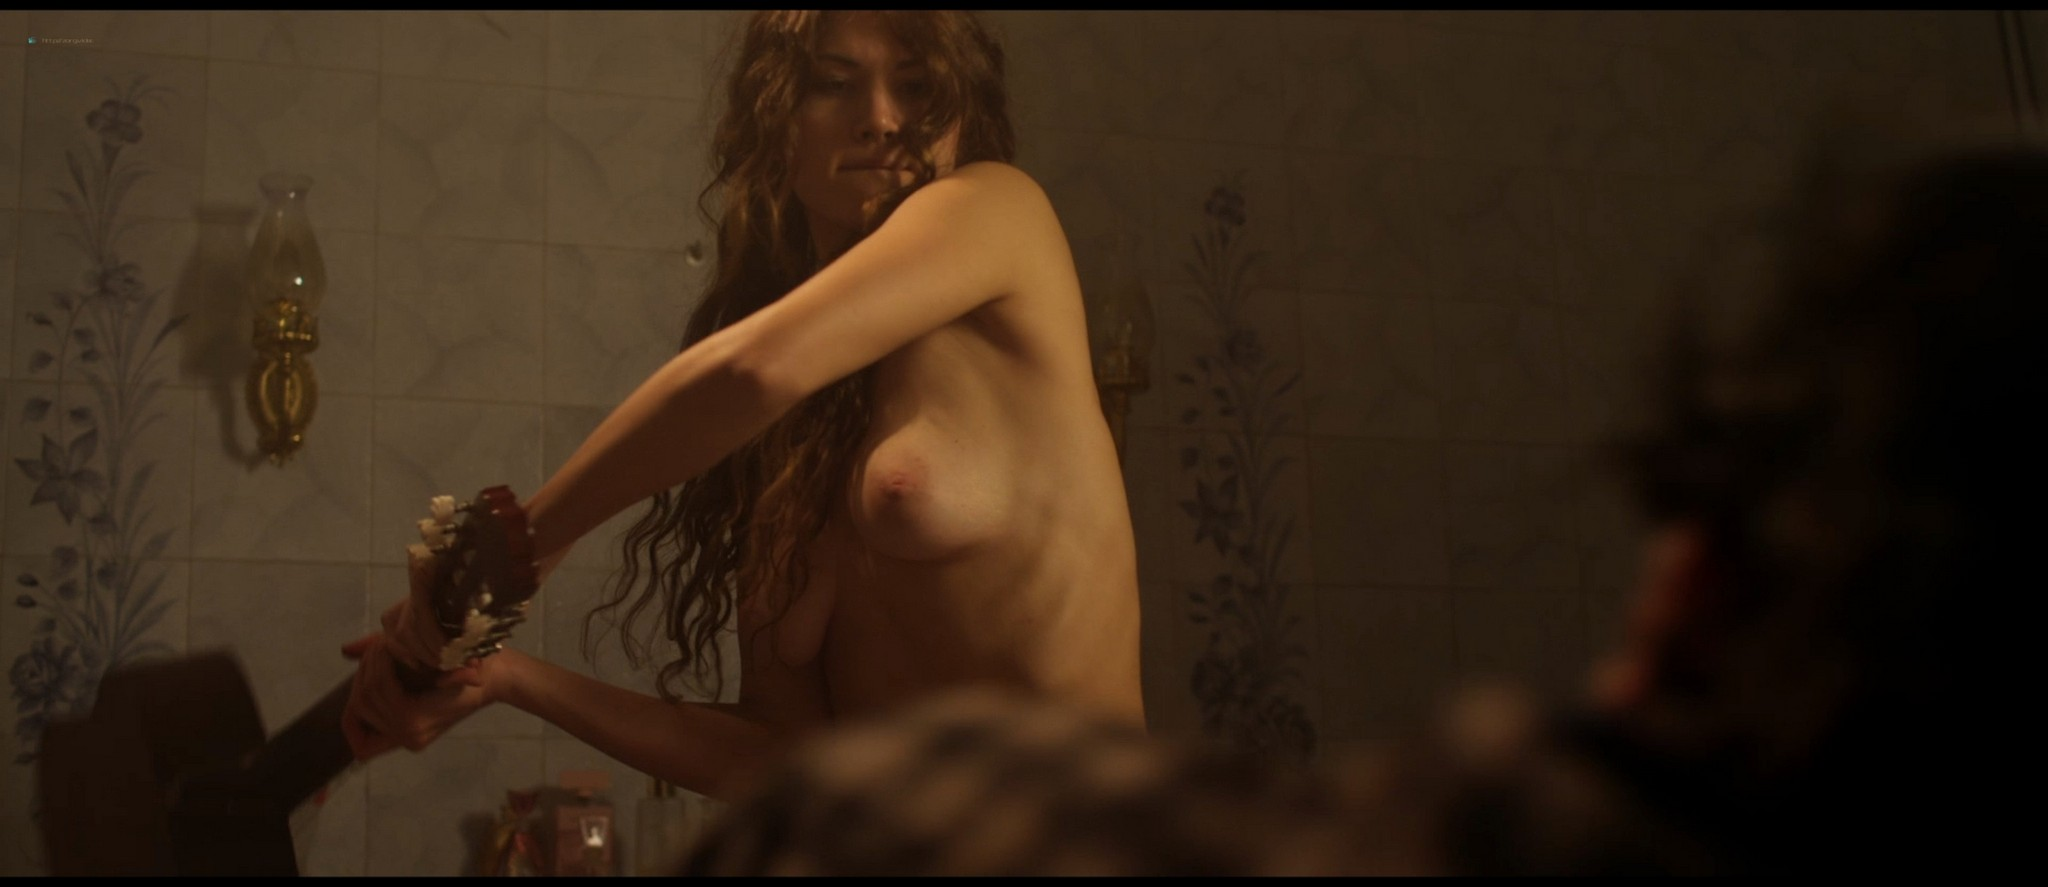 Elena Mirela nude Grazia Leone, Denny Méndez nude too - Blood Trap (2016) HD 1080p BluRay (4)